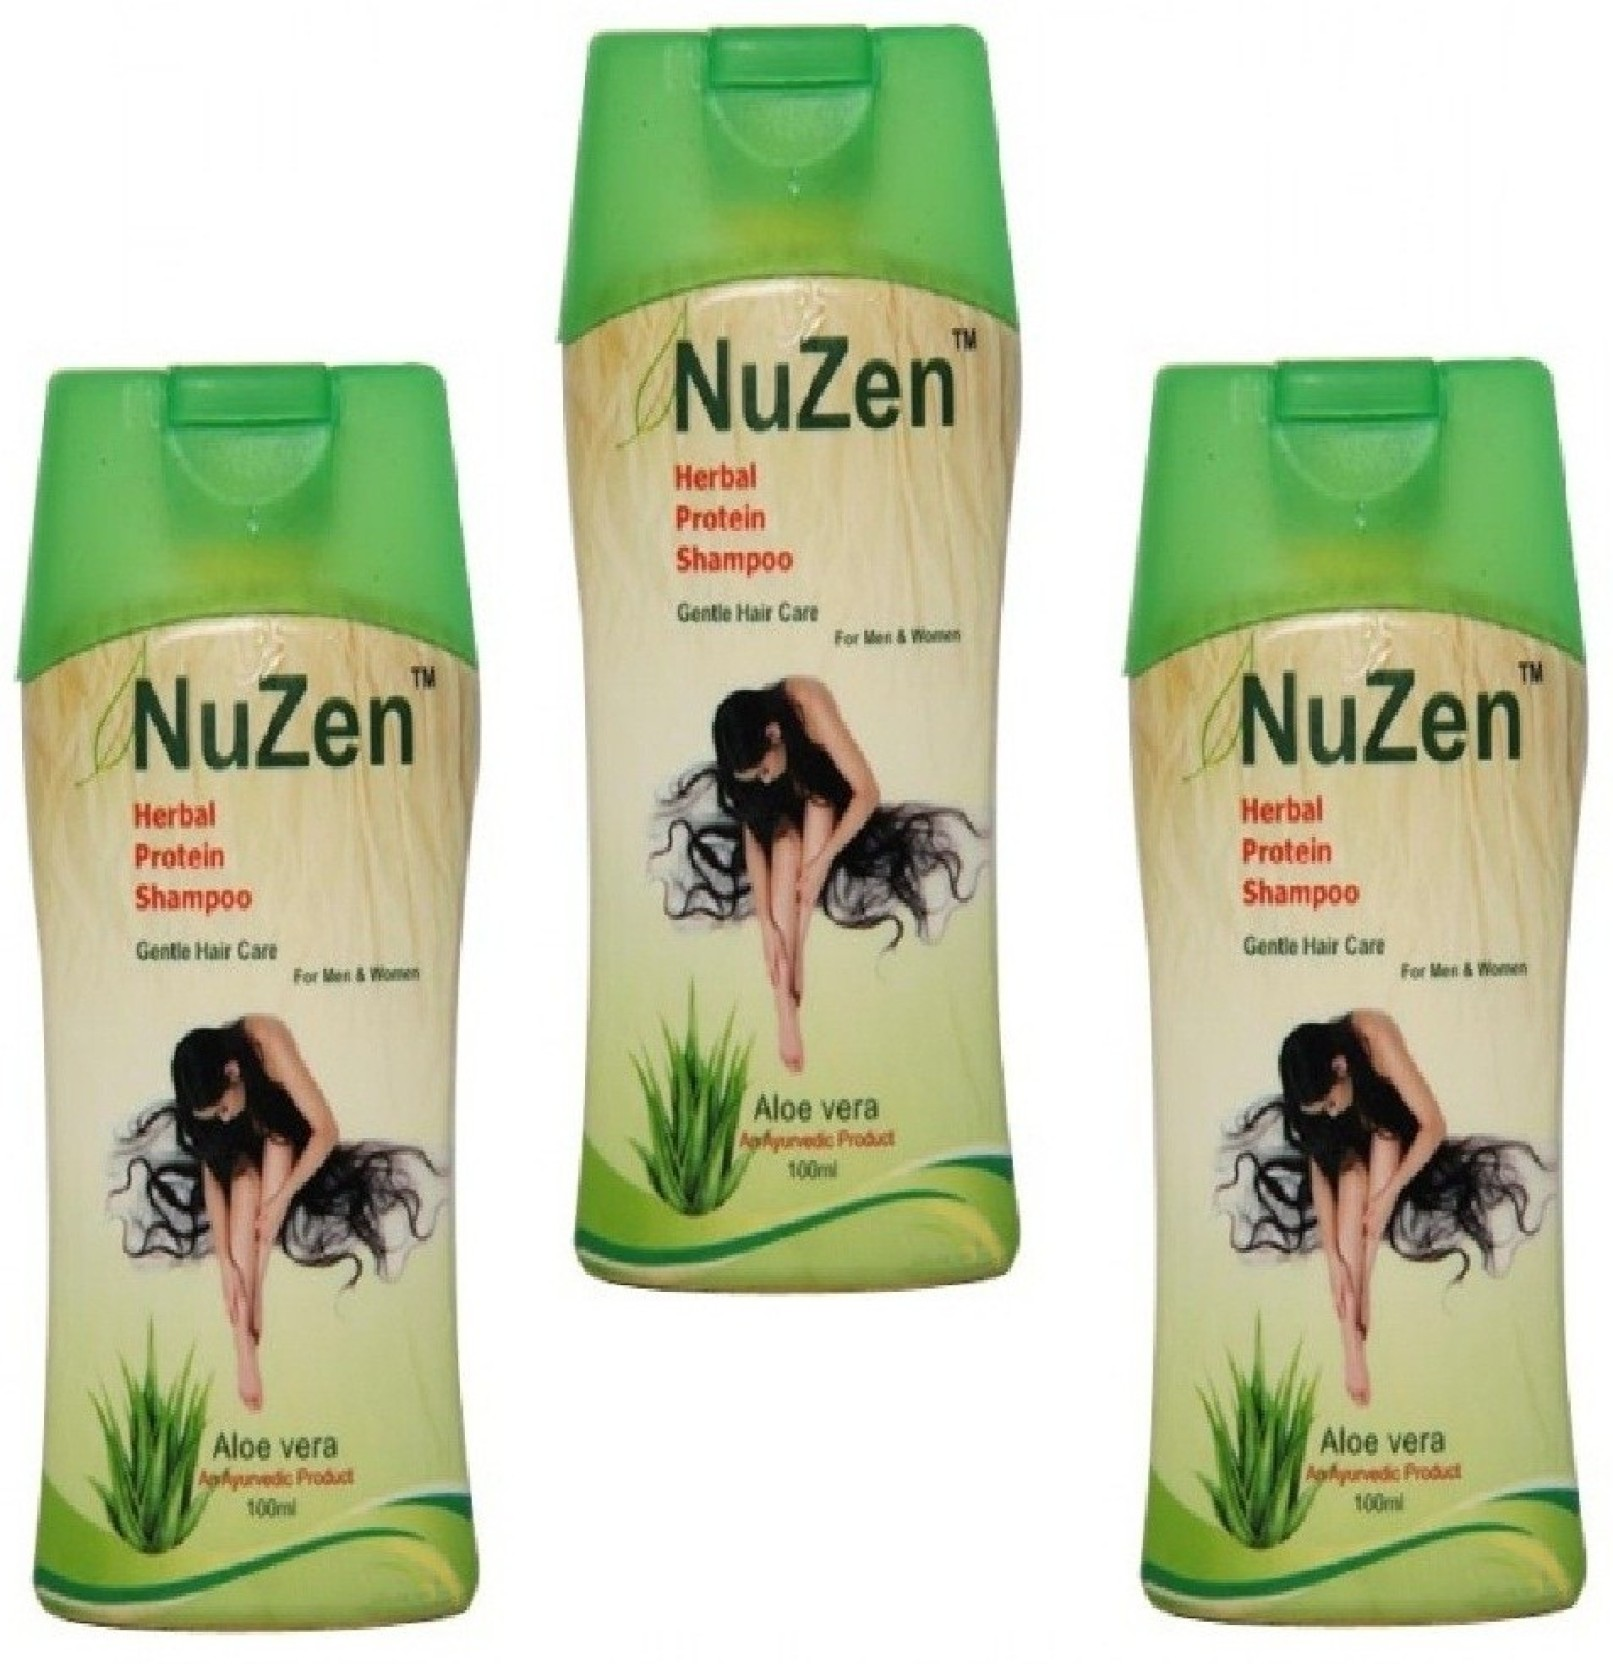 Nuzen Herbal Protein Shampoo (Pack of 3) - Price in India